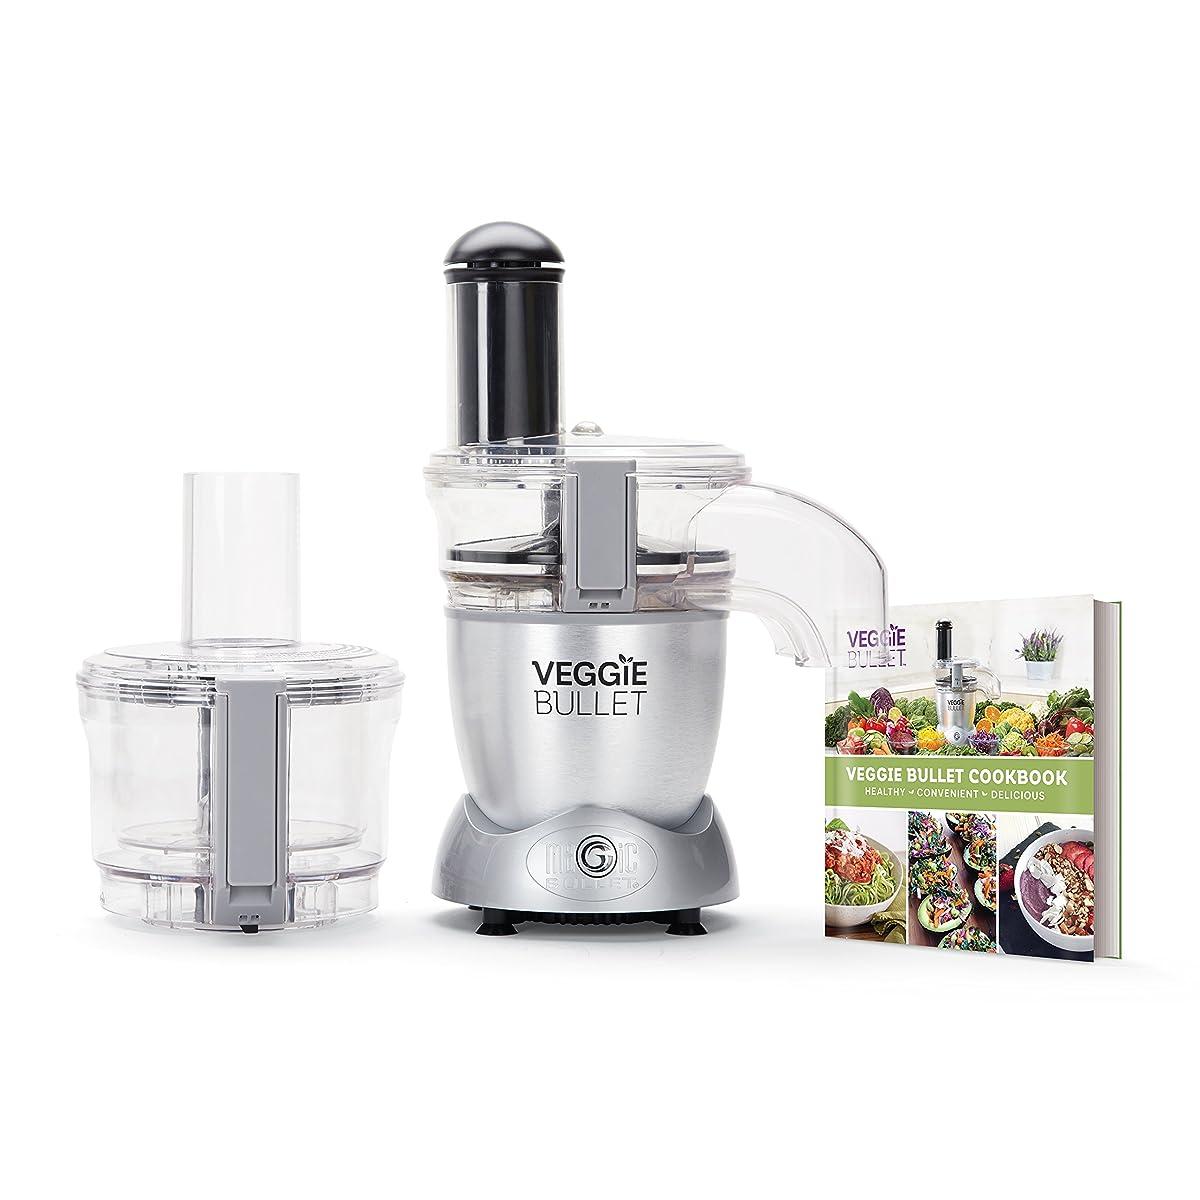 Veggie Bullet Electric Spiralizer & Food Processor, Silver